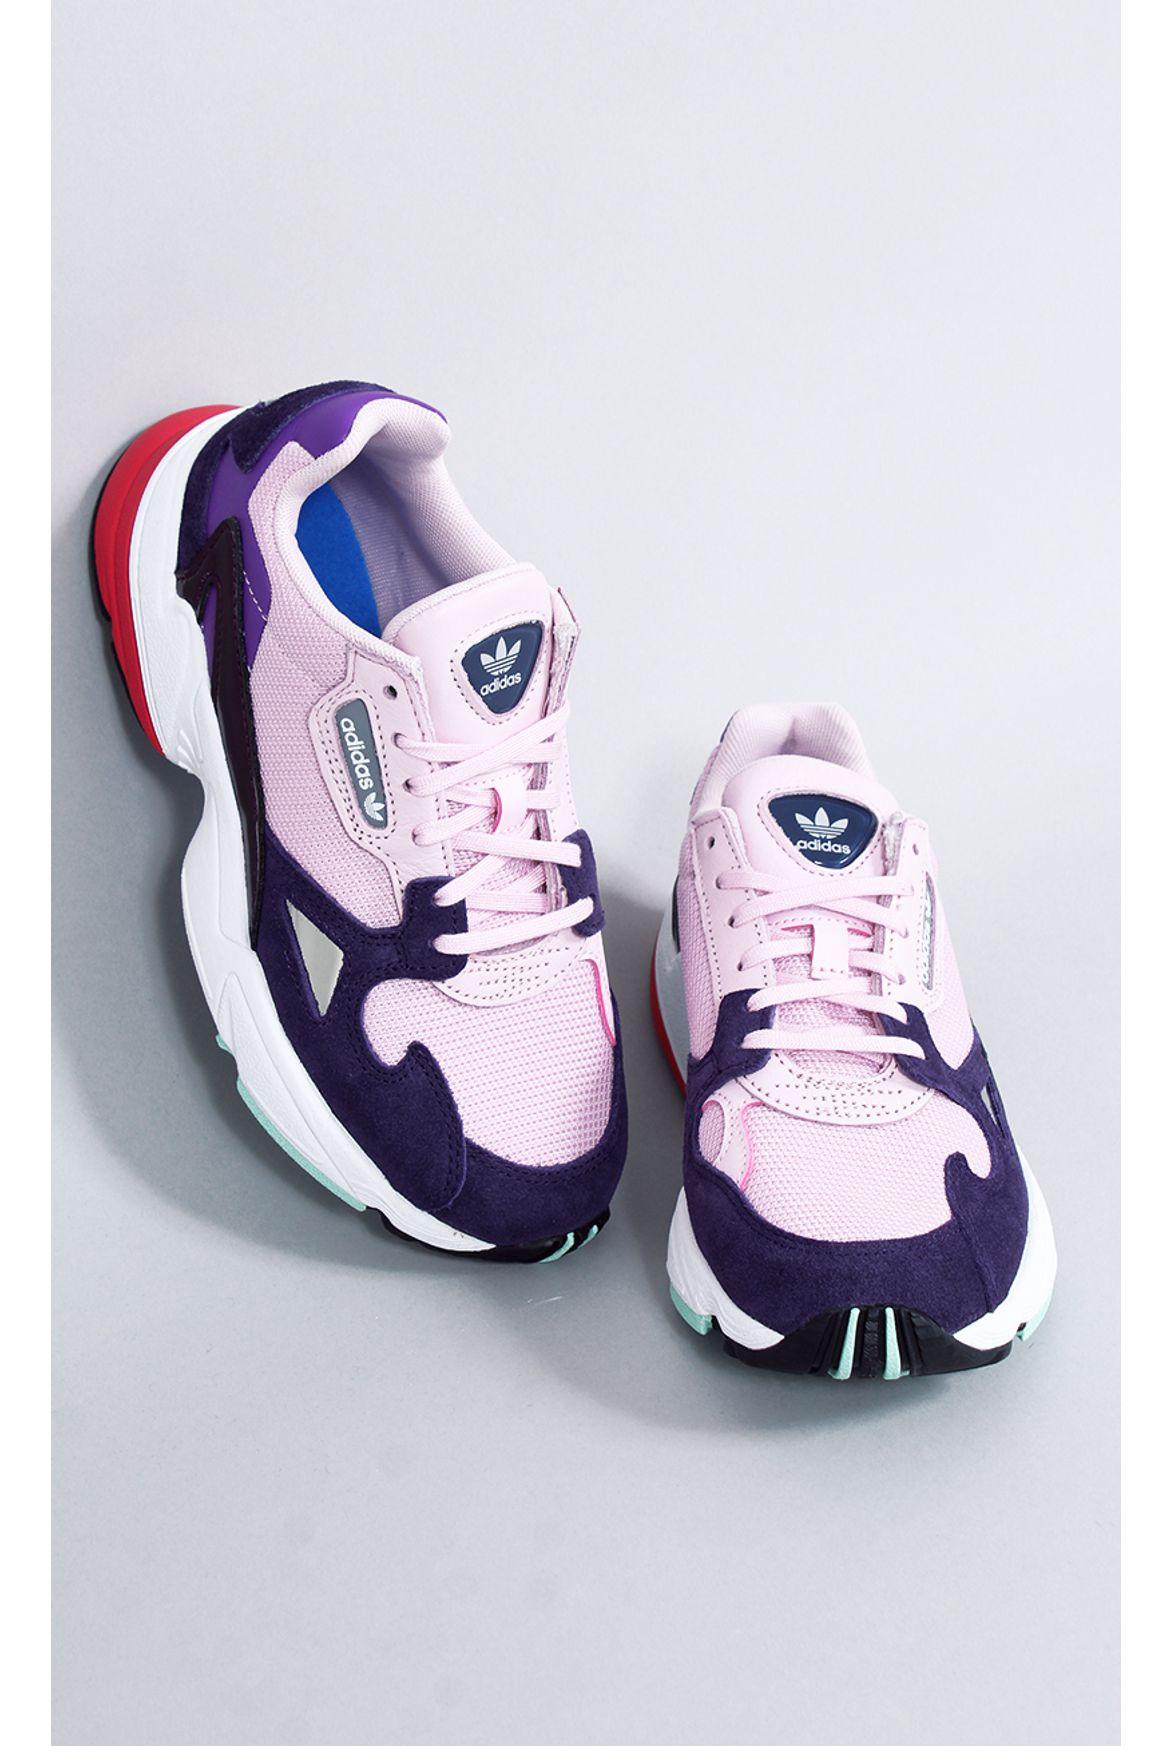 422059bc7e9 FSHN tênis adidas falcon w 25 rosa - Fashion Closet